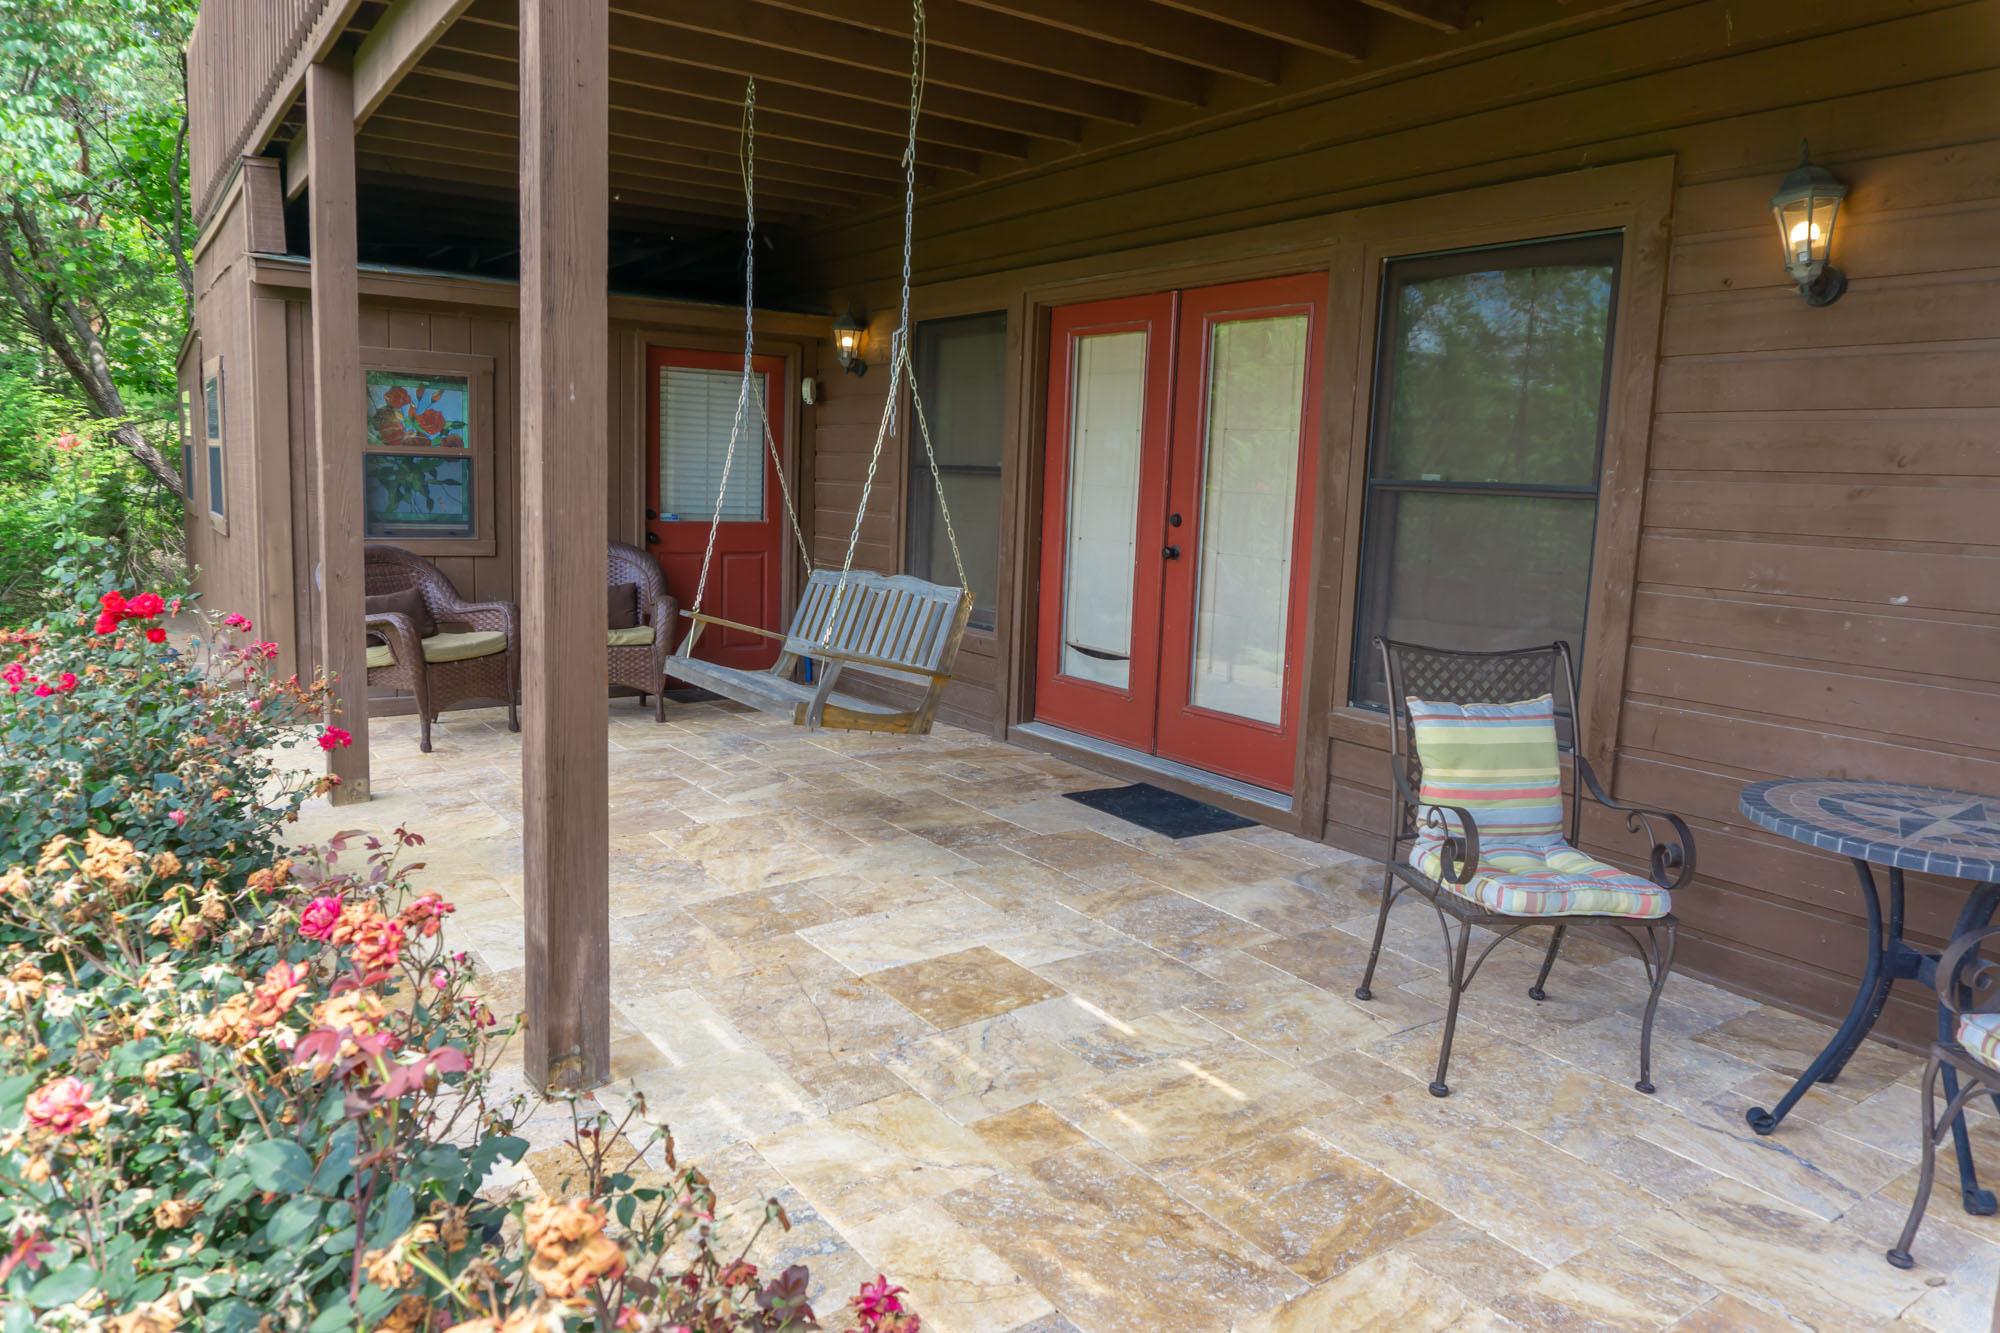 Smoky-Mountain-Splendor-lower-level-patio-from-yard-on-angle